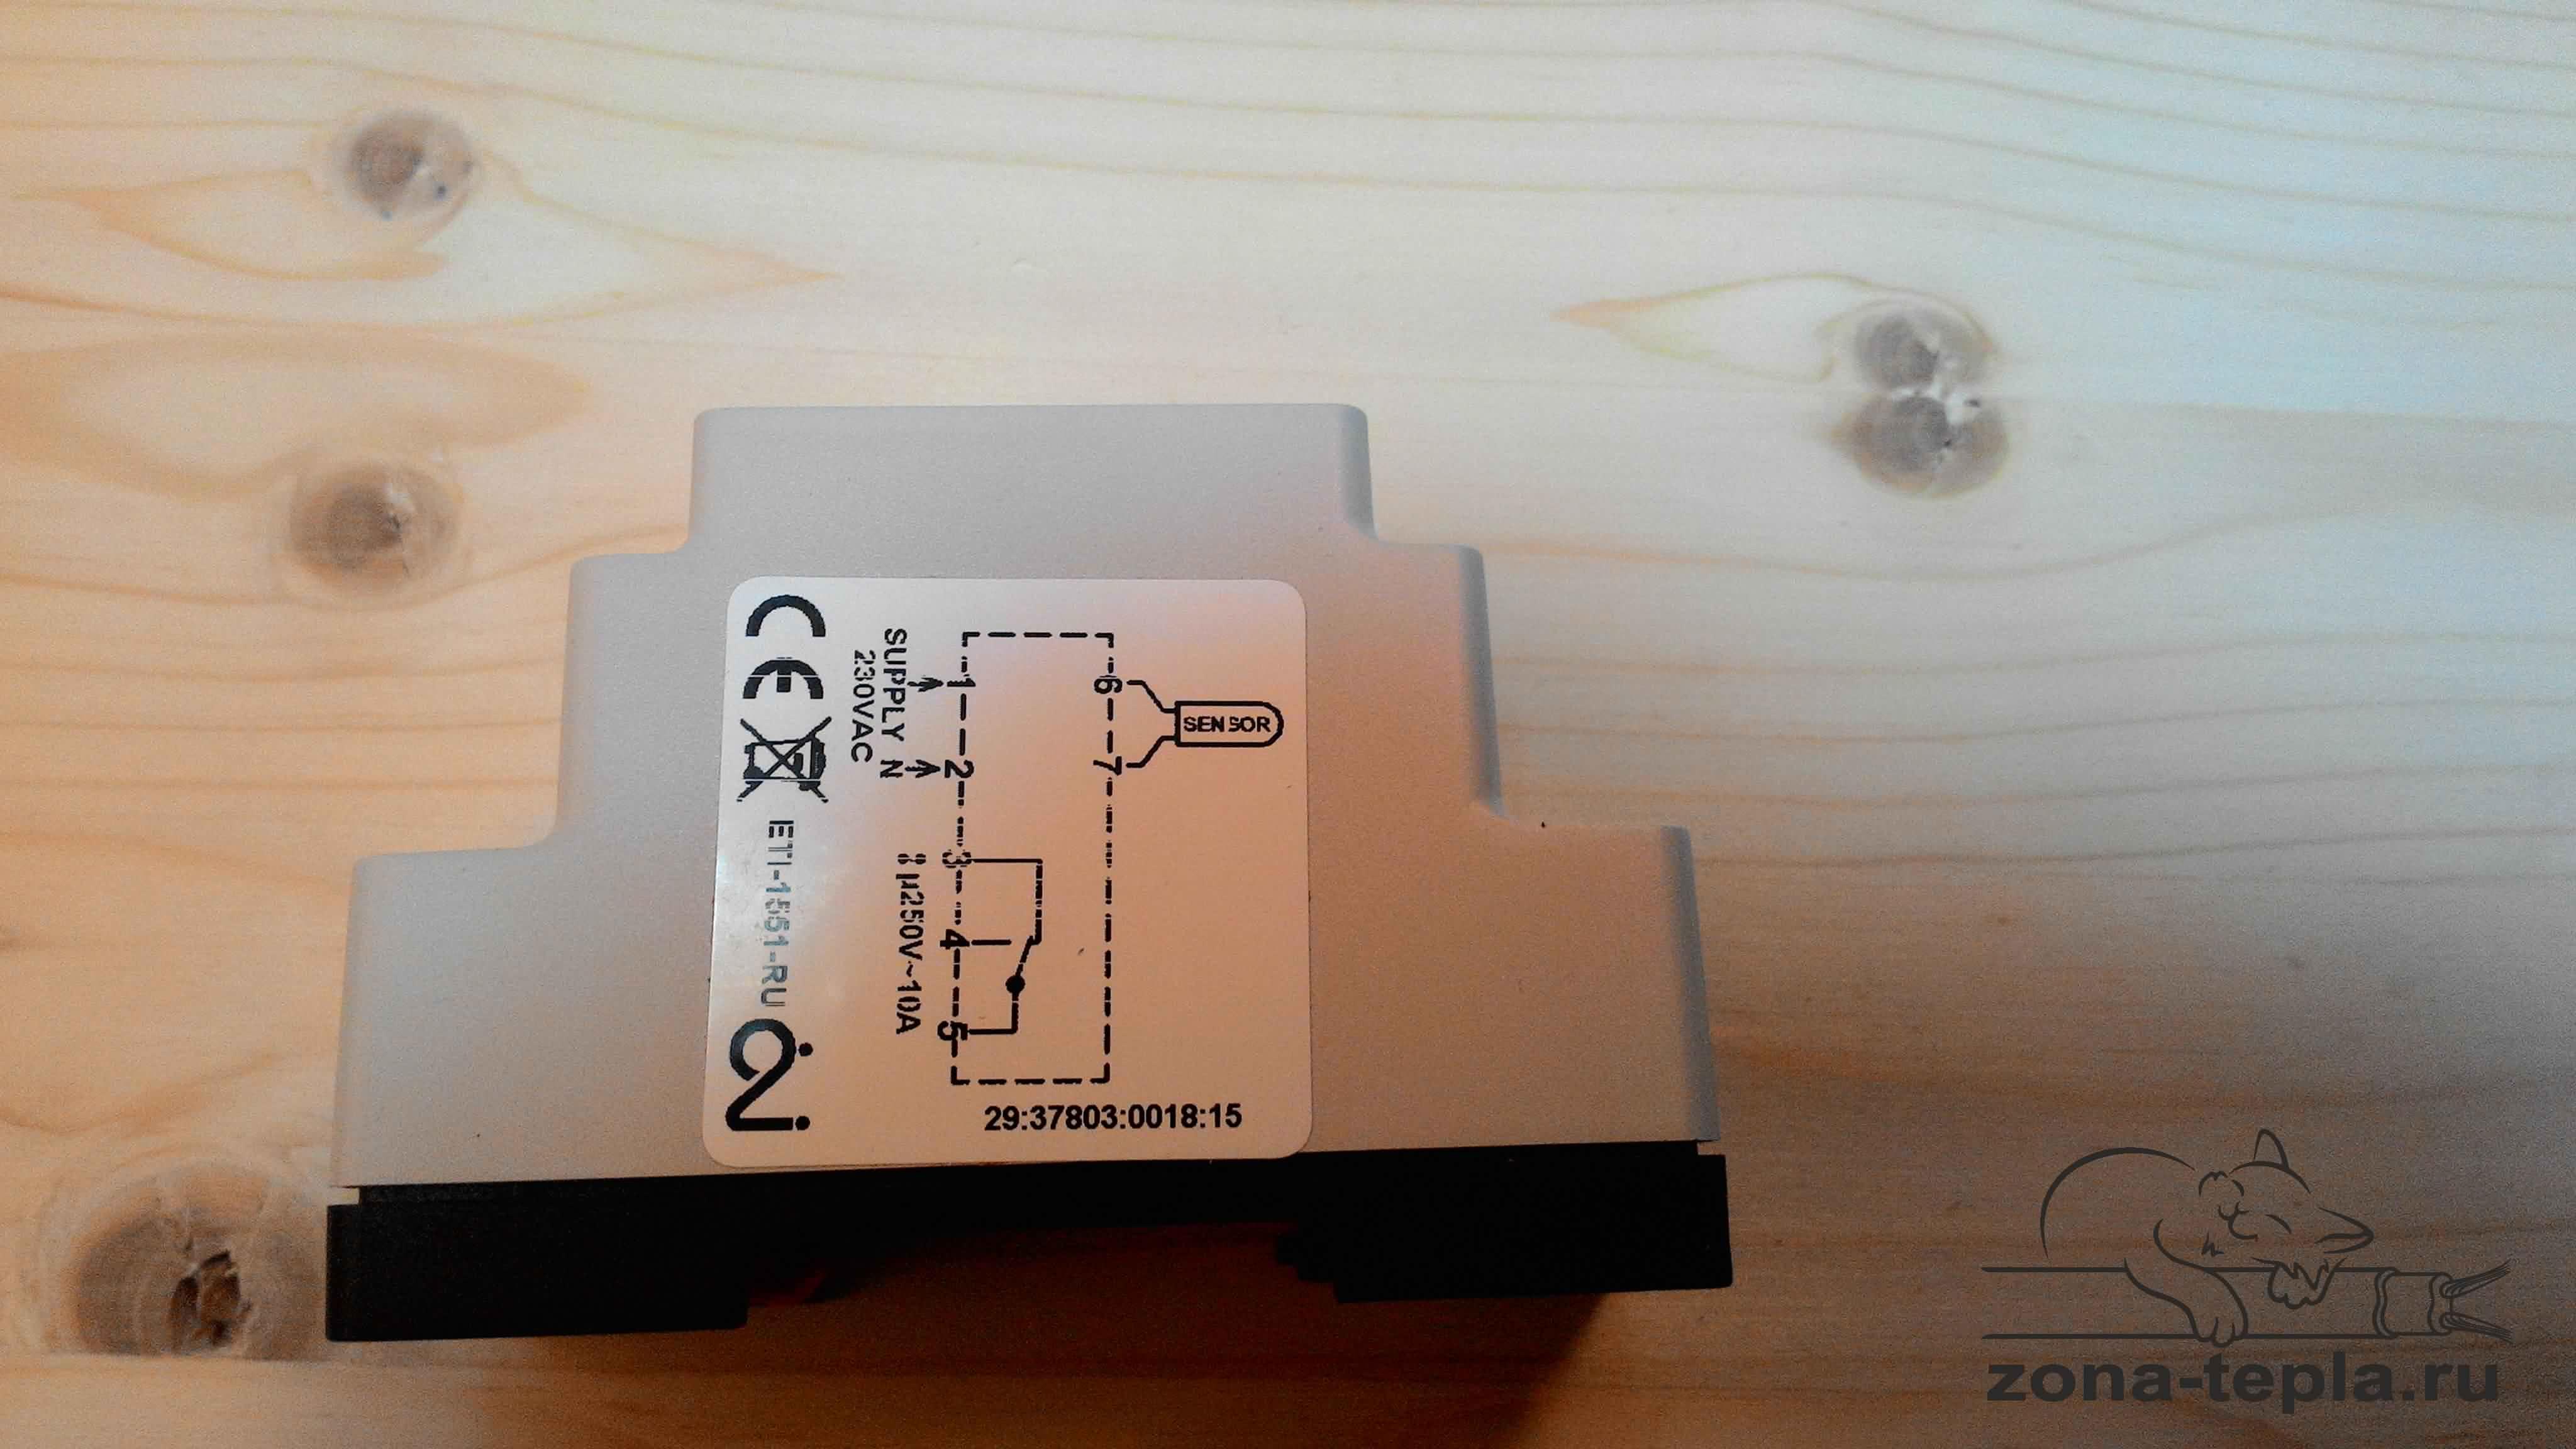 Терморегулятор промышленный ETI-1551